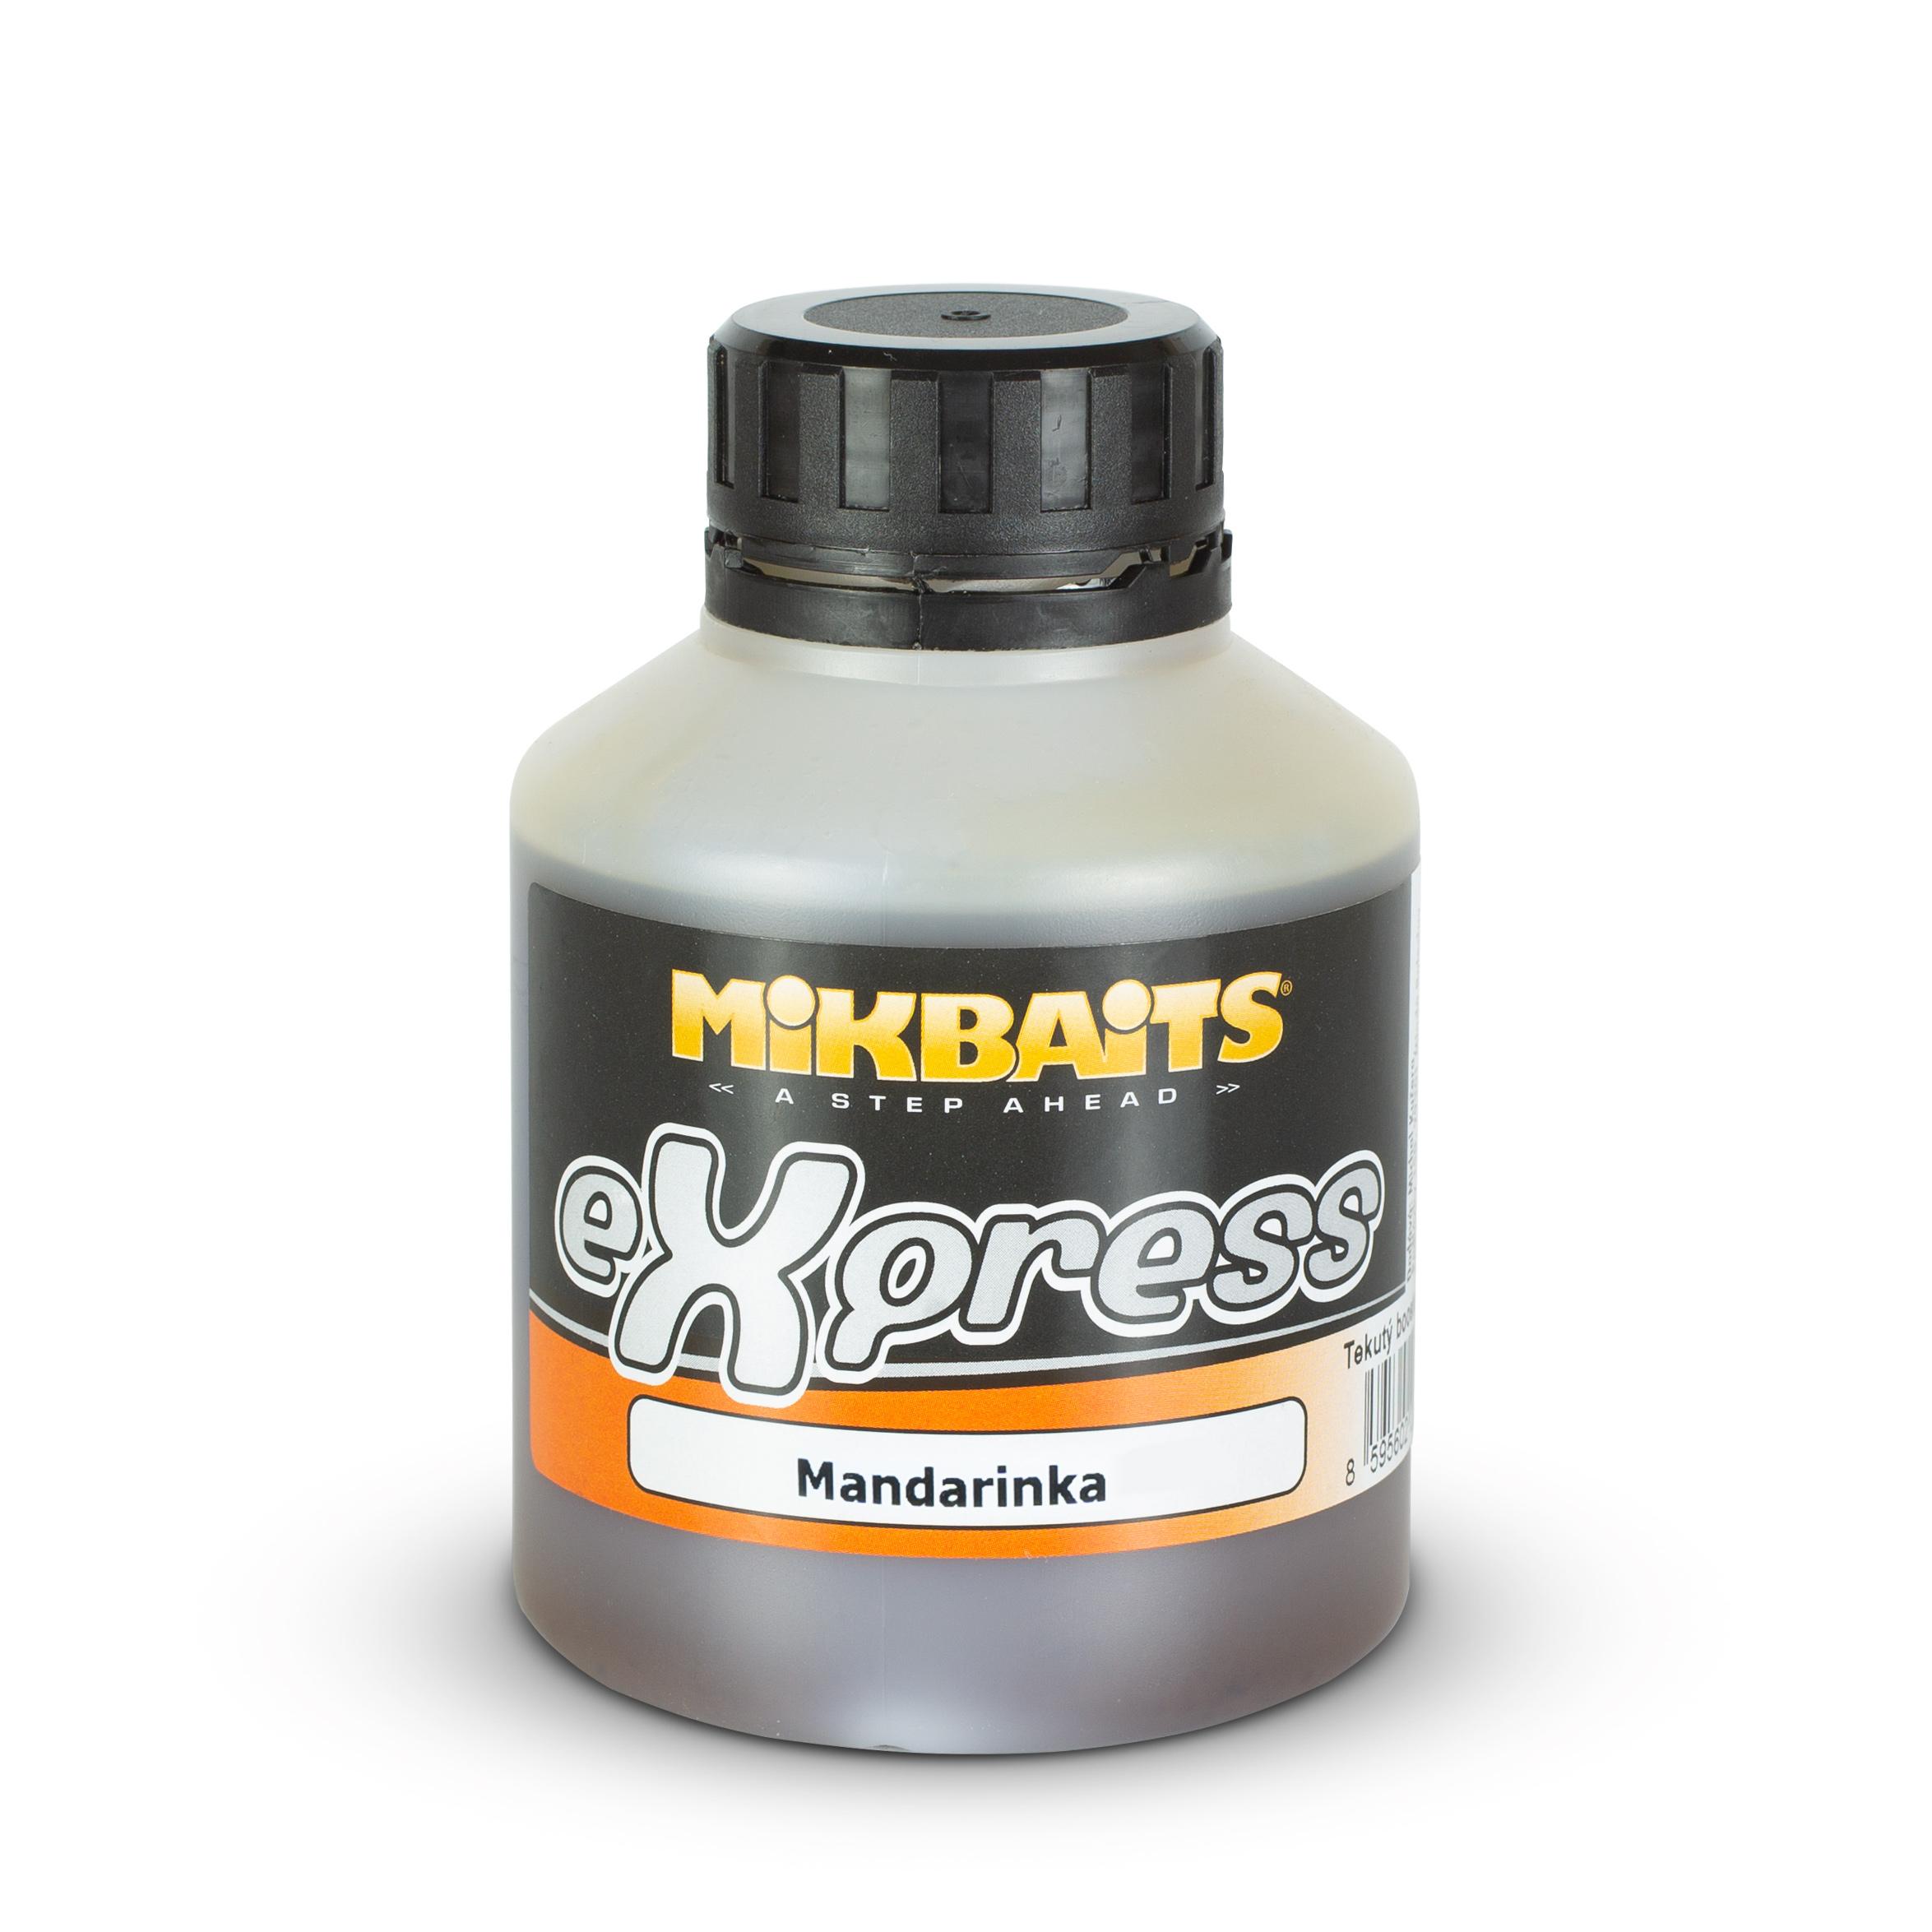 eXpress booster 250ml - Mandarinka